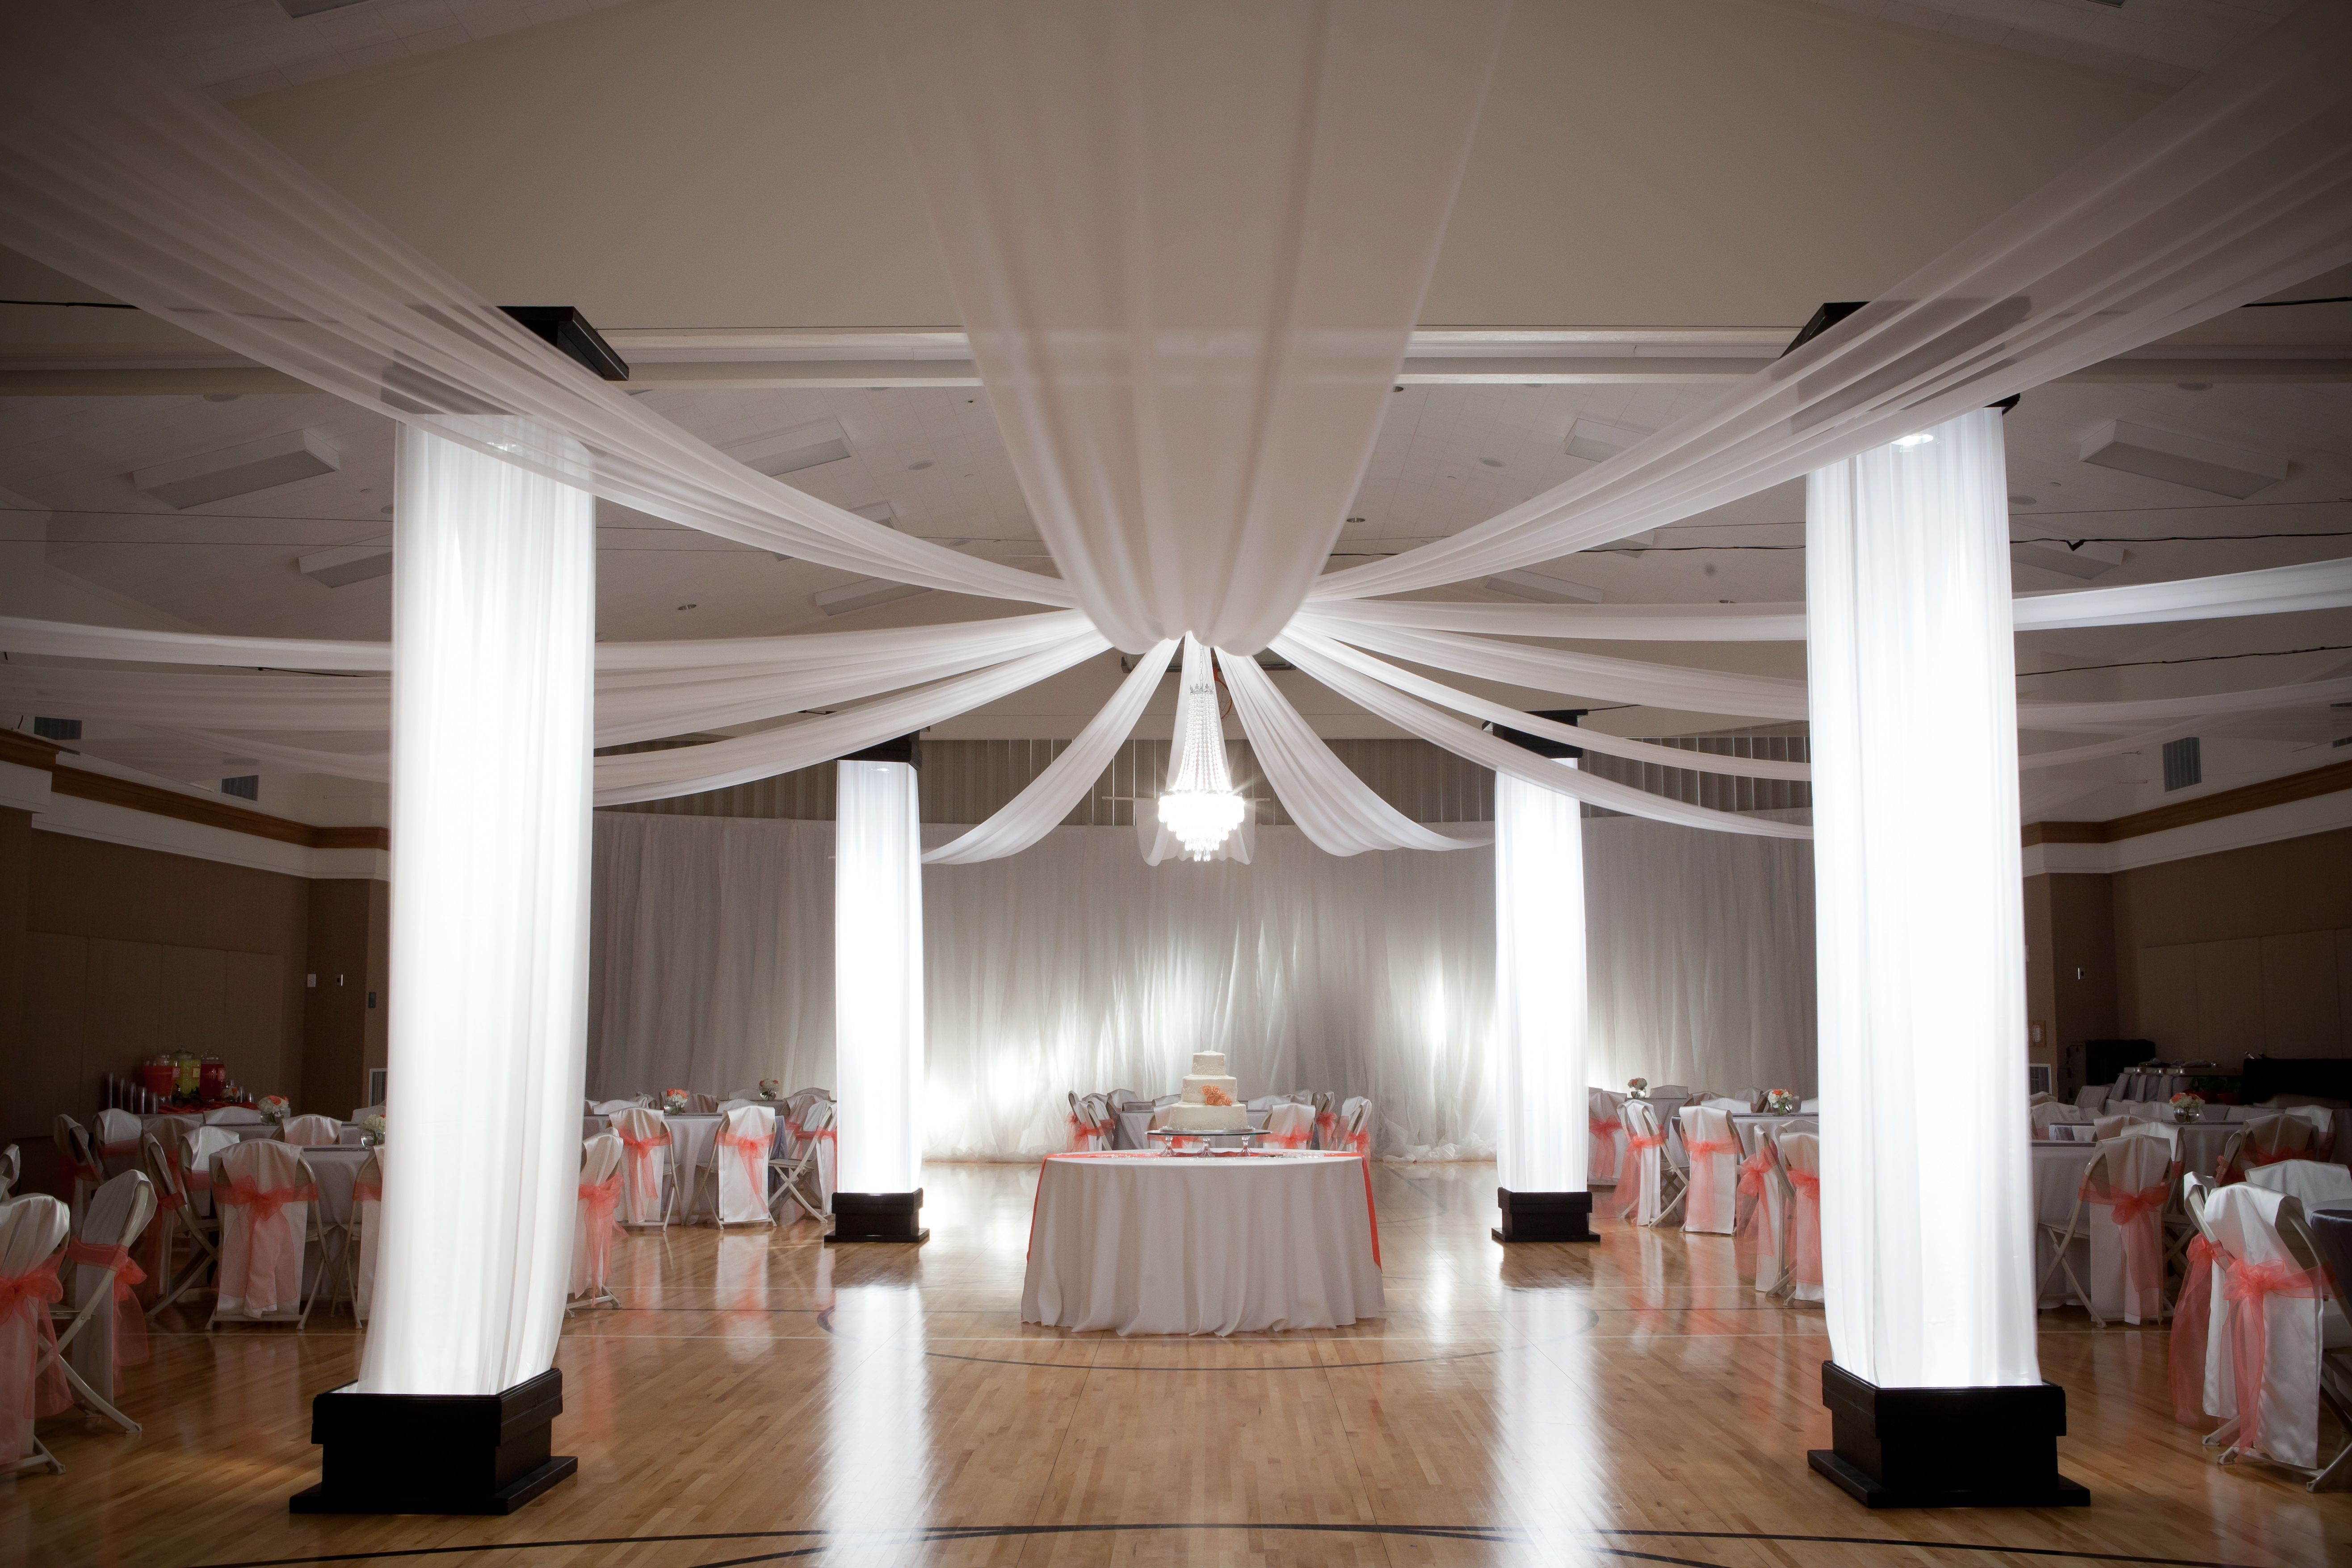 diy wedding reception lighting. Gym Reception #lighting #drapes Diy Wedding Lighting D